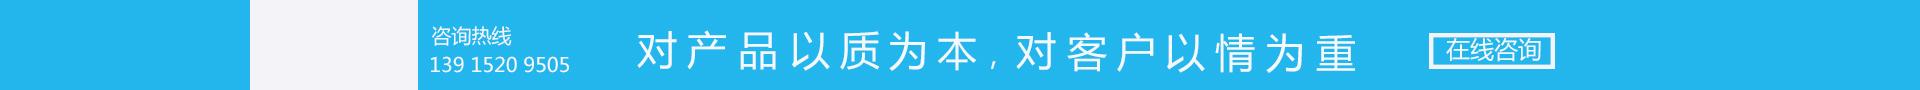 未標(biao)題-4.jpg